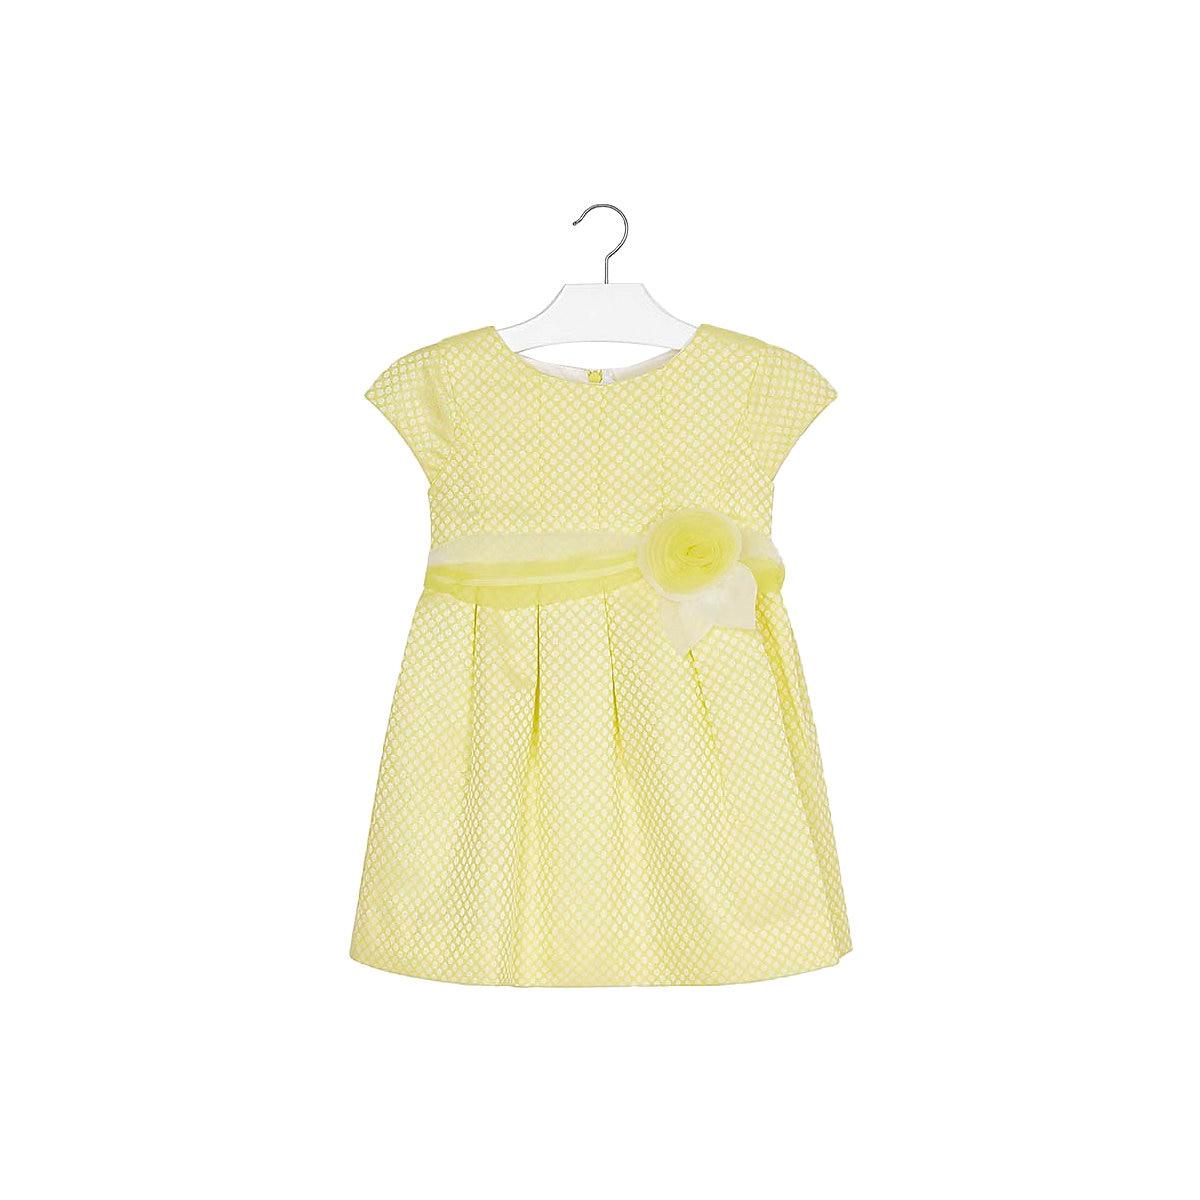 MAYORAL Dresses 10688901 Girl Children Party fitted pleated skirt Yellow Polyester Preppy Style Solid Knee-Length Short Sleeve tribal style fringe hem short skirt